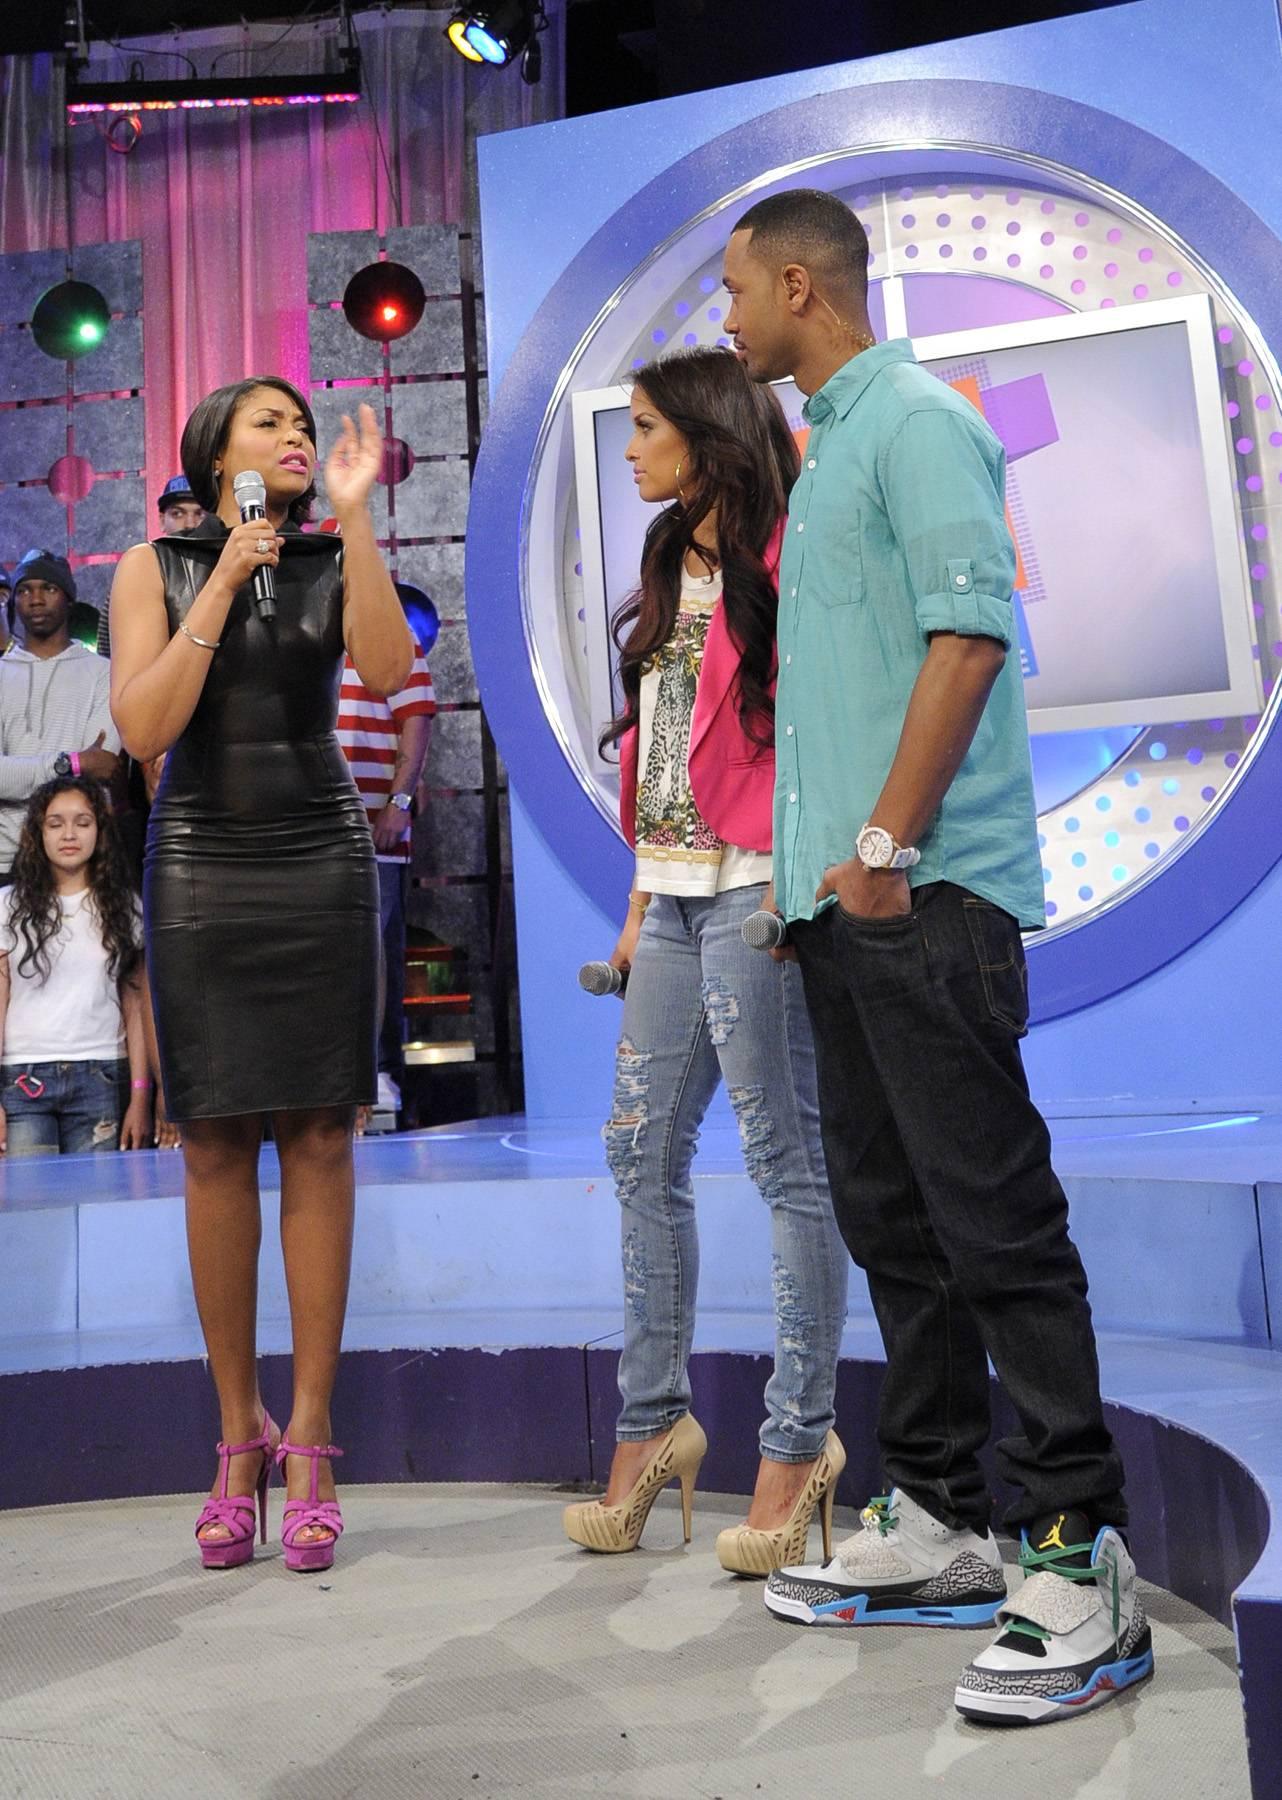 Let Me Tell You - Taraji P. Henson with Terrence J and Rocsi Diaz at 106 & Park, April 17, 2012. (Photo: John Ricard/BET)